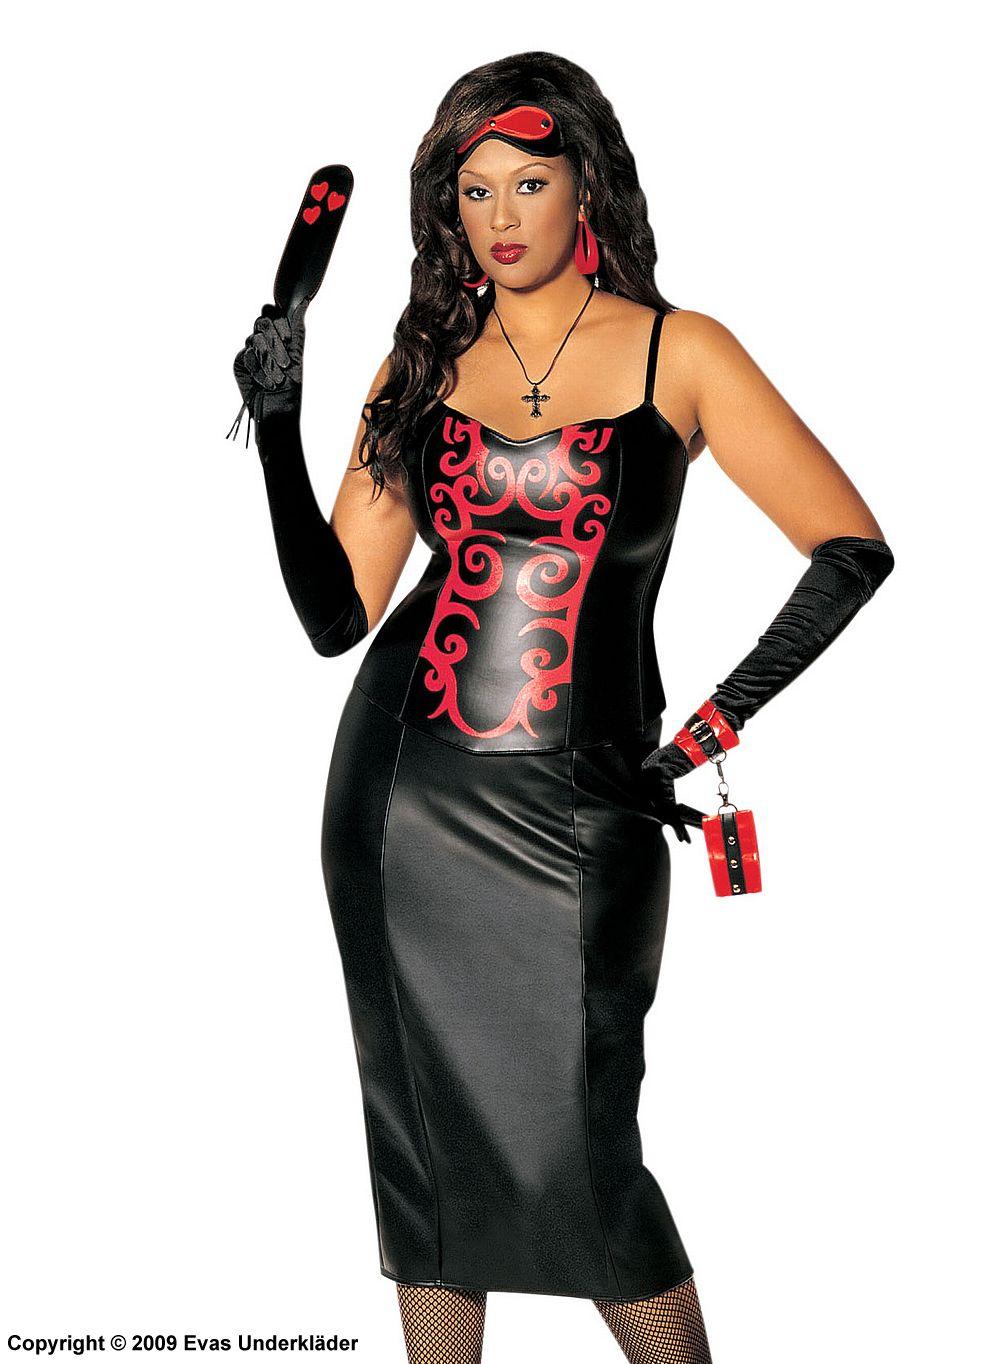 2c31a7c3e923c Dominatrix costume with faux leather corset